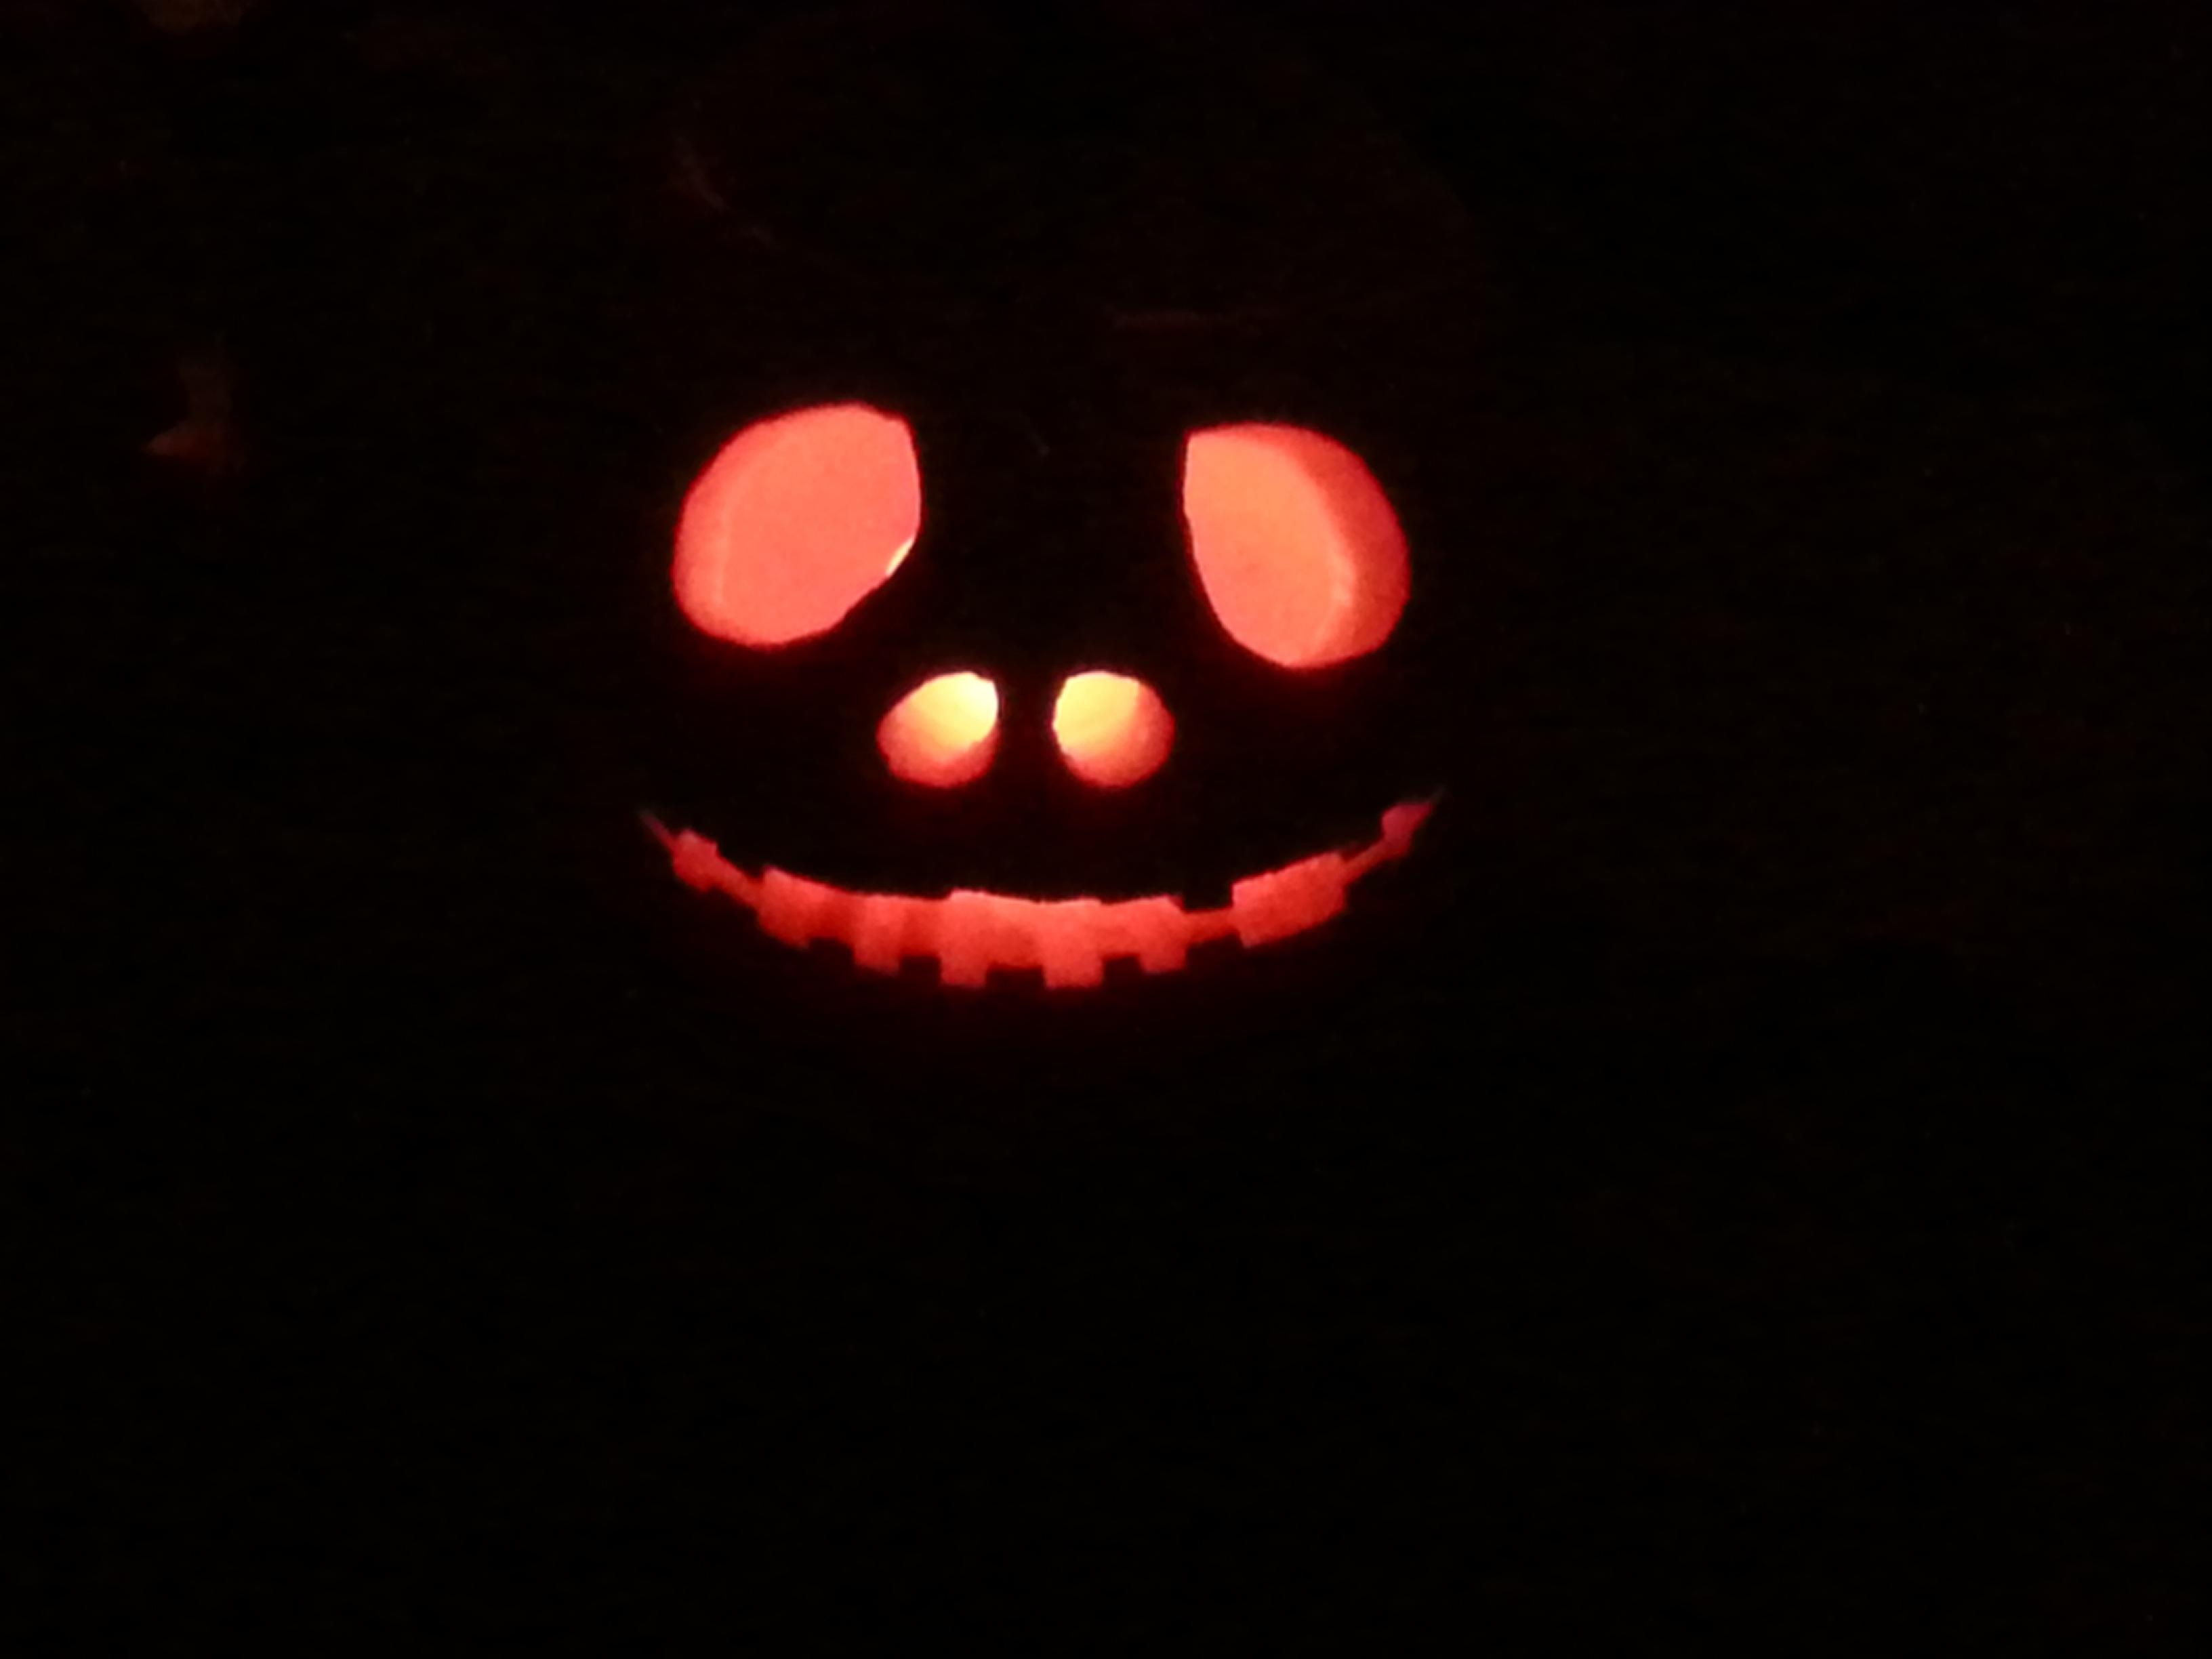 free images night fall spooky dark celebration decoration